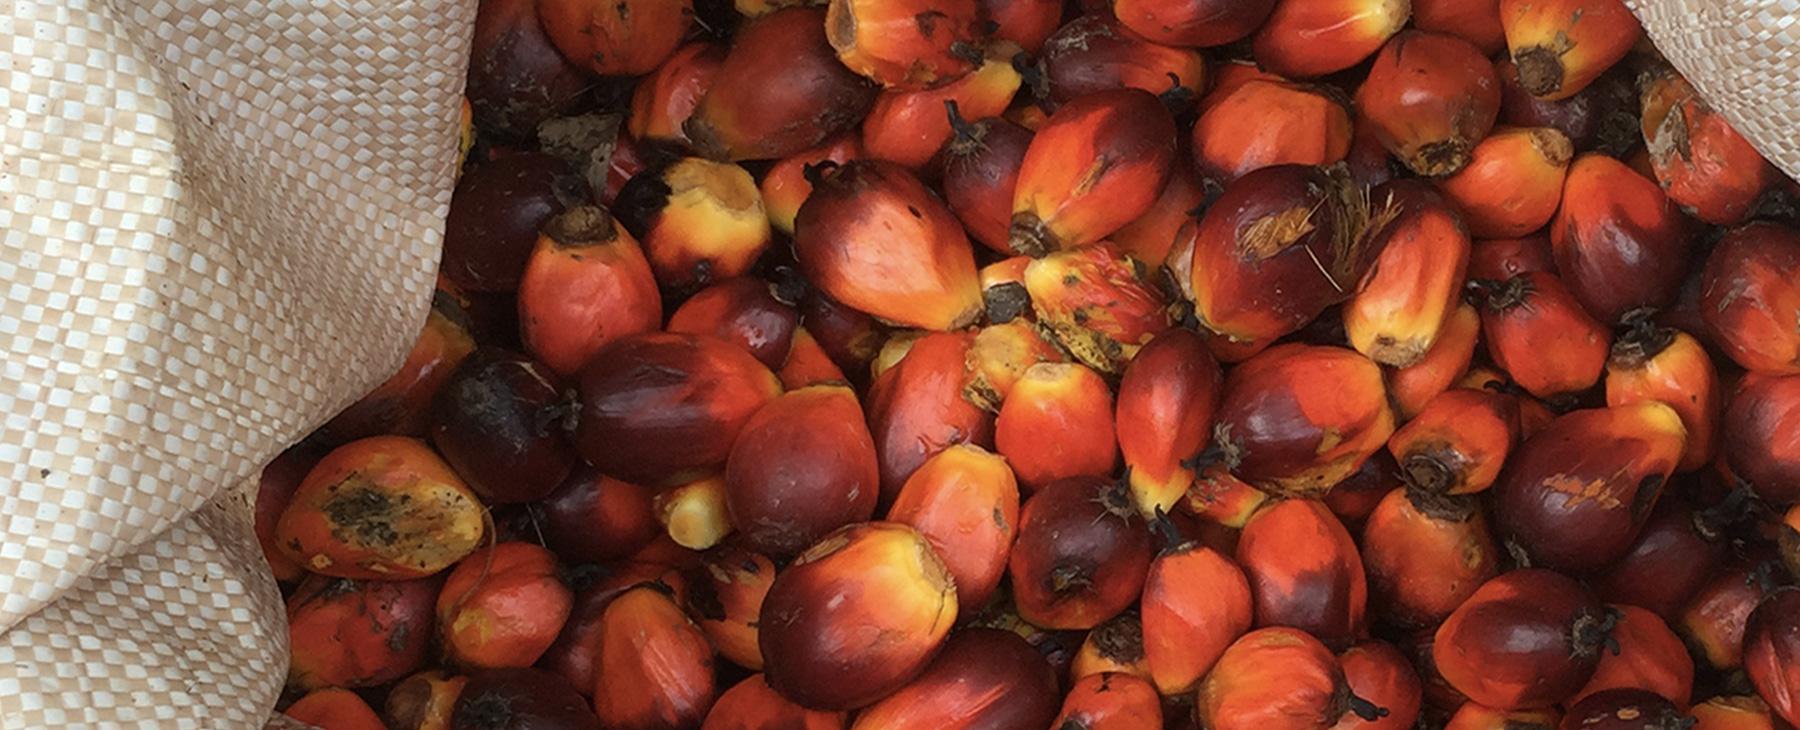 UBI - LUB - palm oil